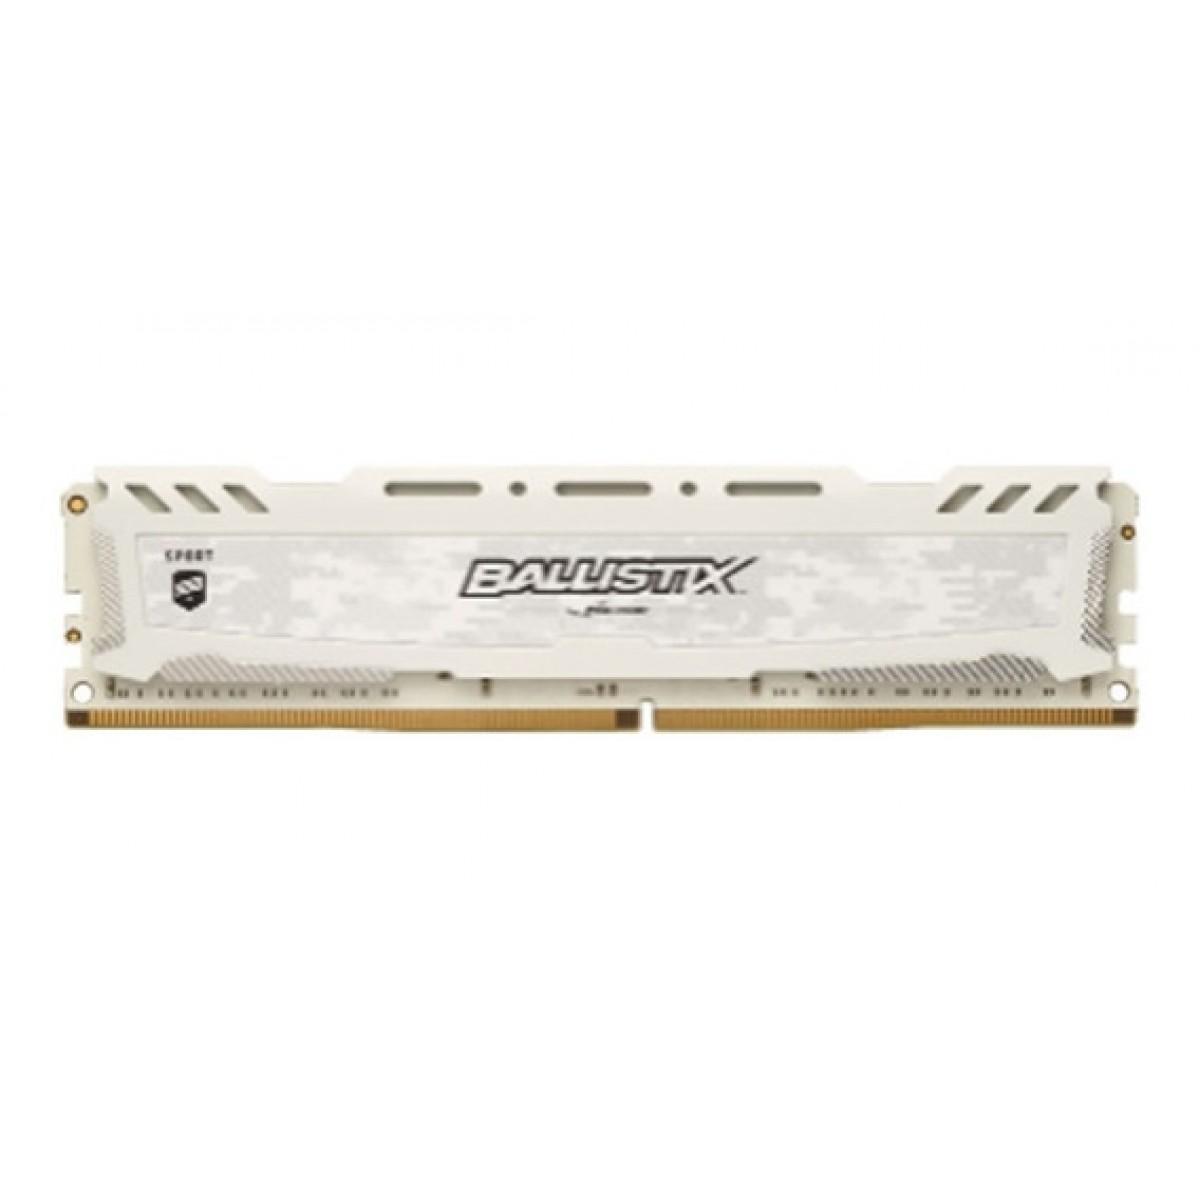 Memória DDR4 Crucial Ballistix Sport LT, 8GB 2400MHz, White, BLS8G4D240FSC